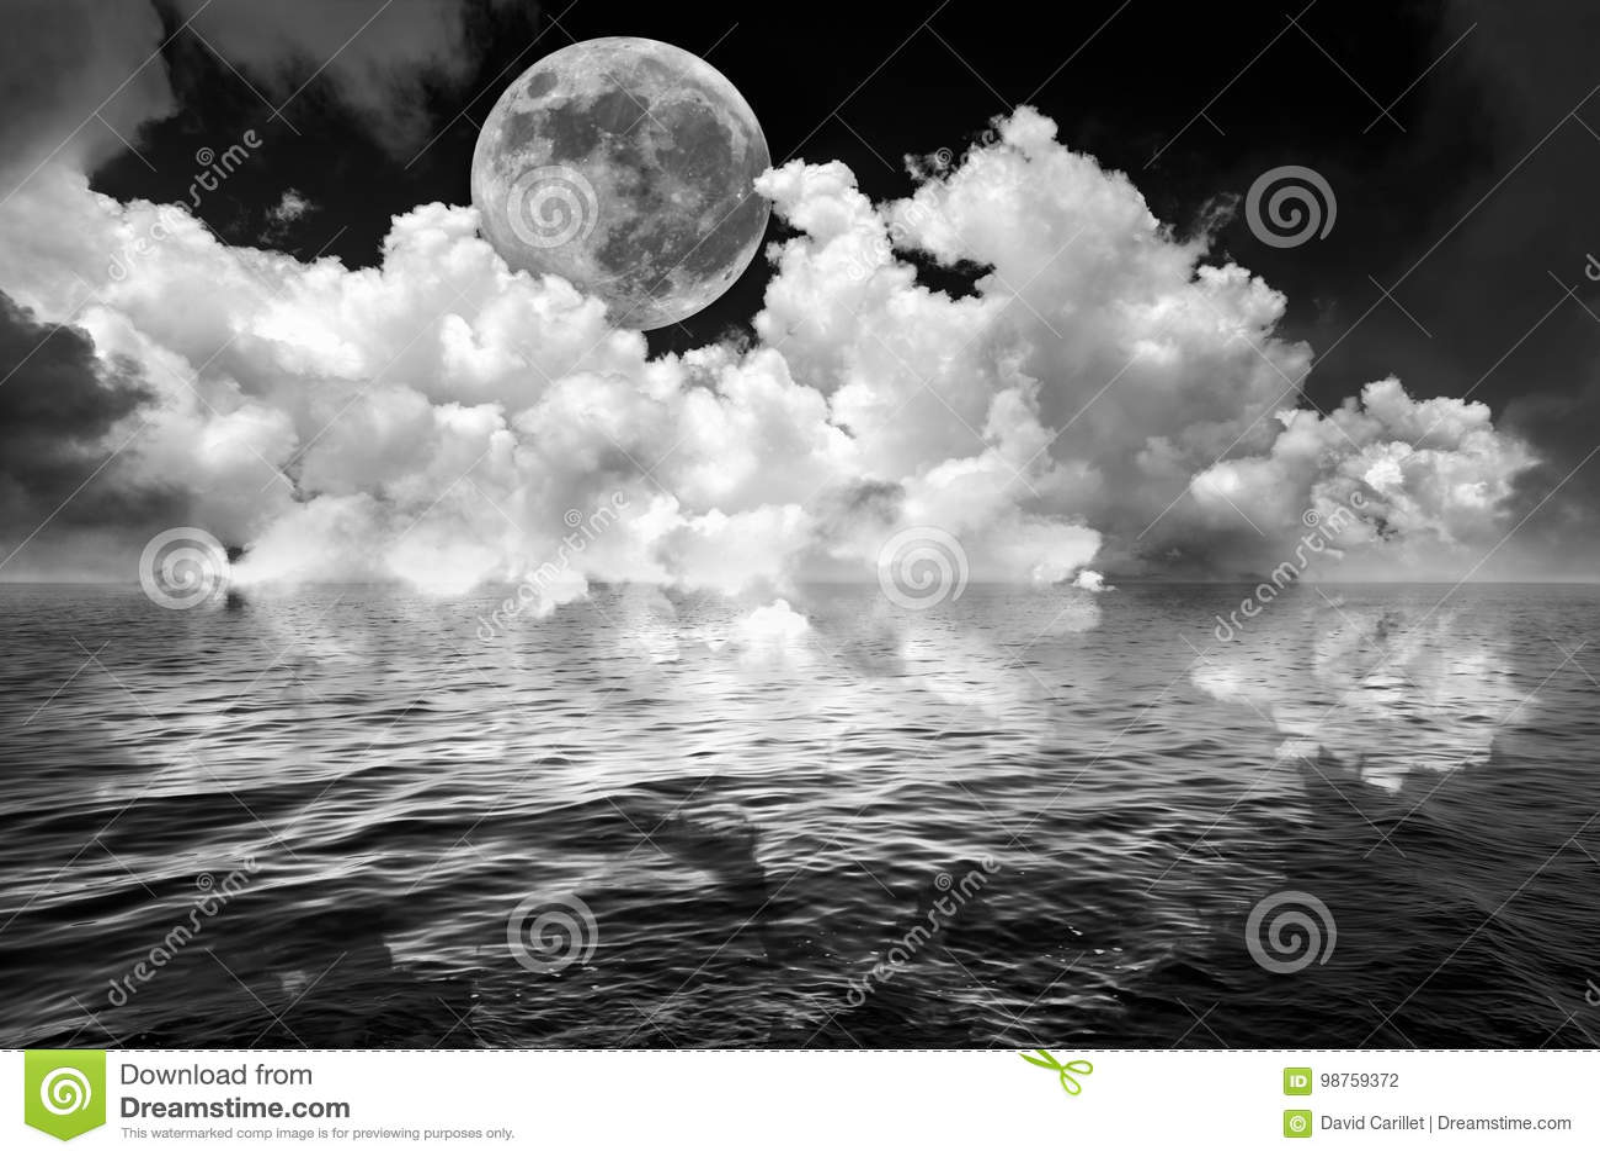 Full moon and clouds in dark fantasy night sky reflected in wavy ocean water